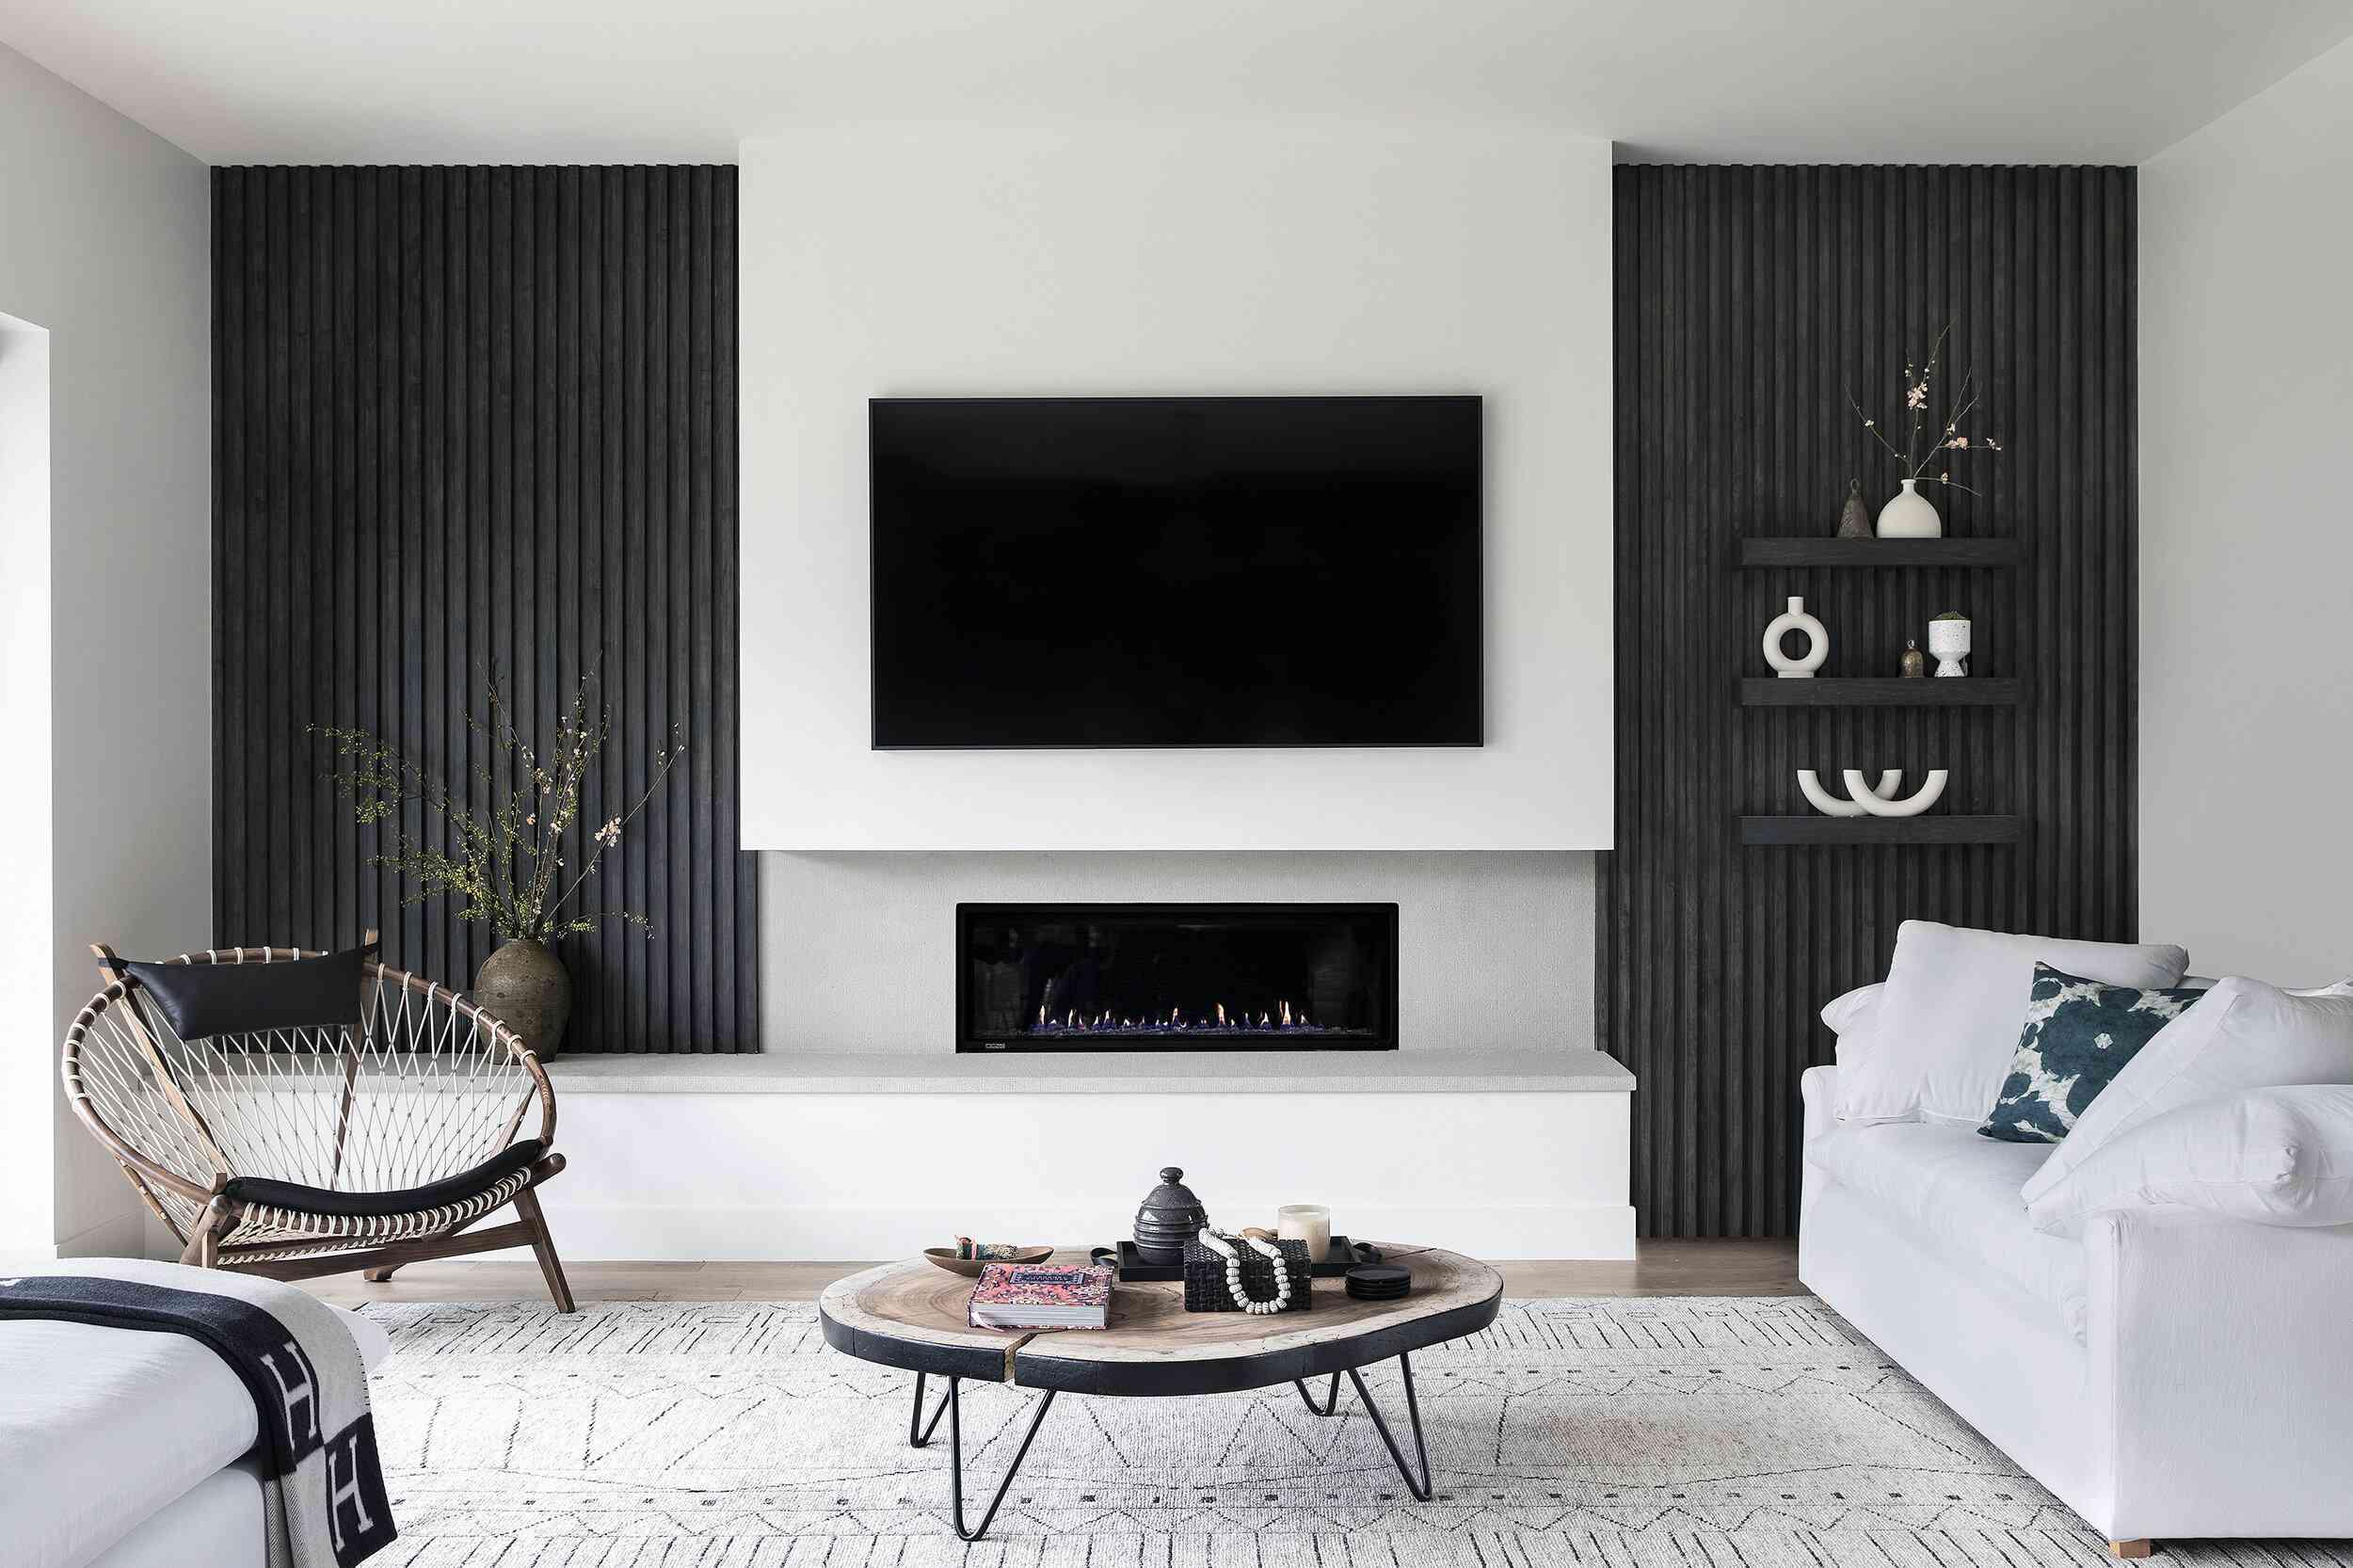 Chic, minimalist living room decor